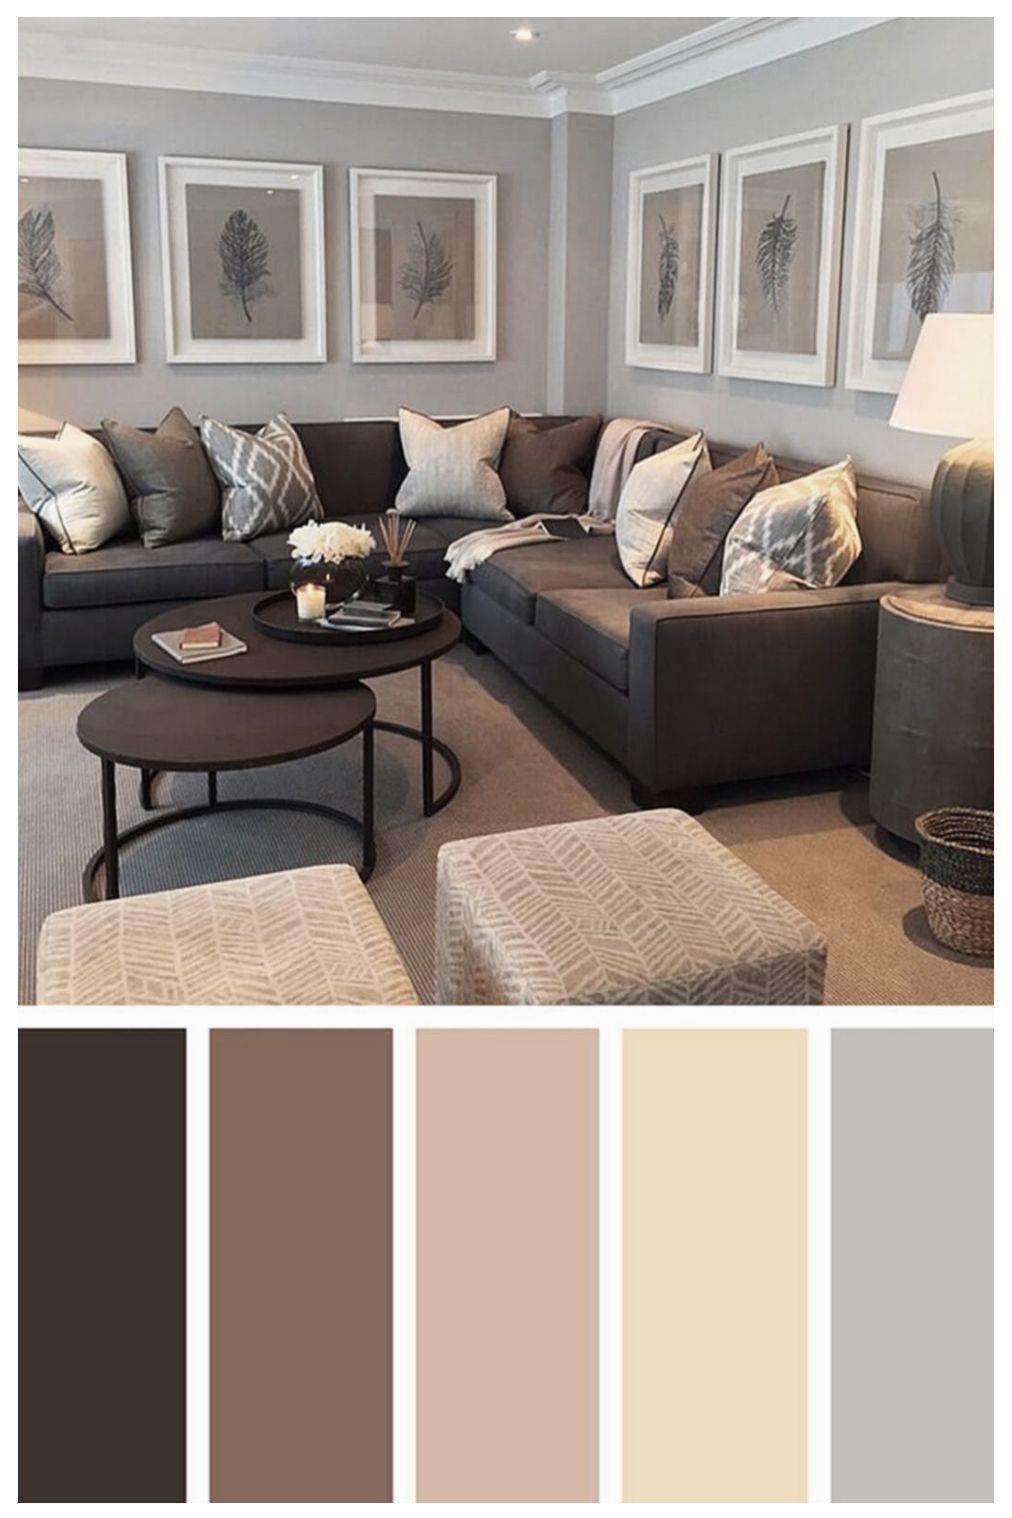 20 Astonishing Living Room Remodel Ideas 2020 L Tips Trend